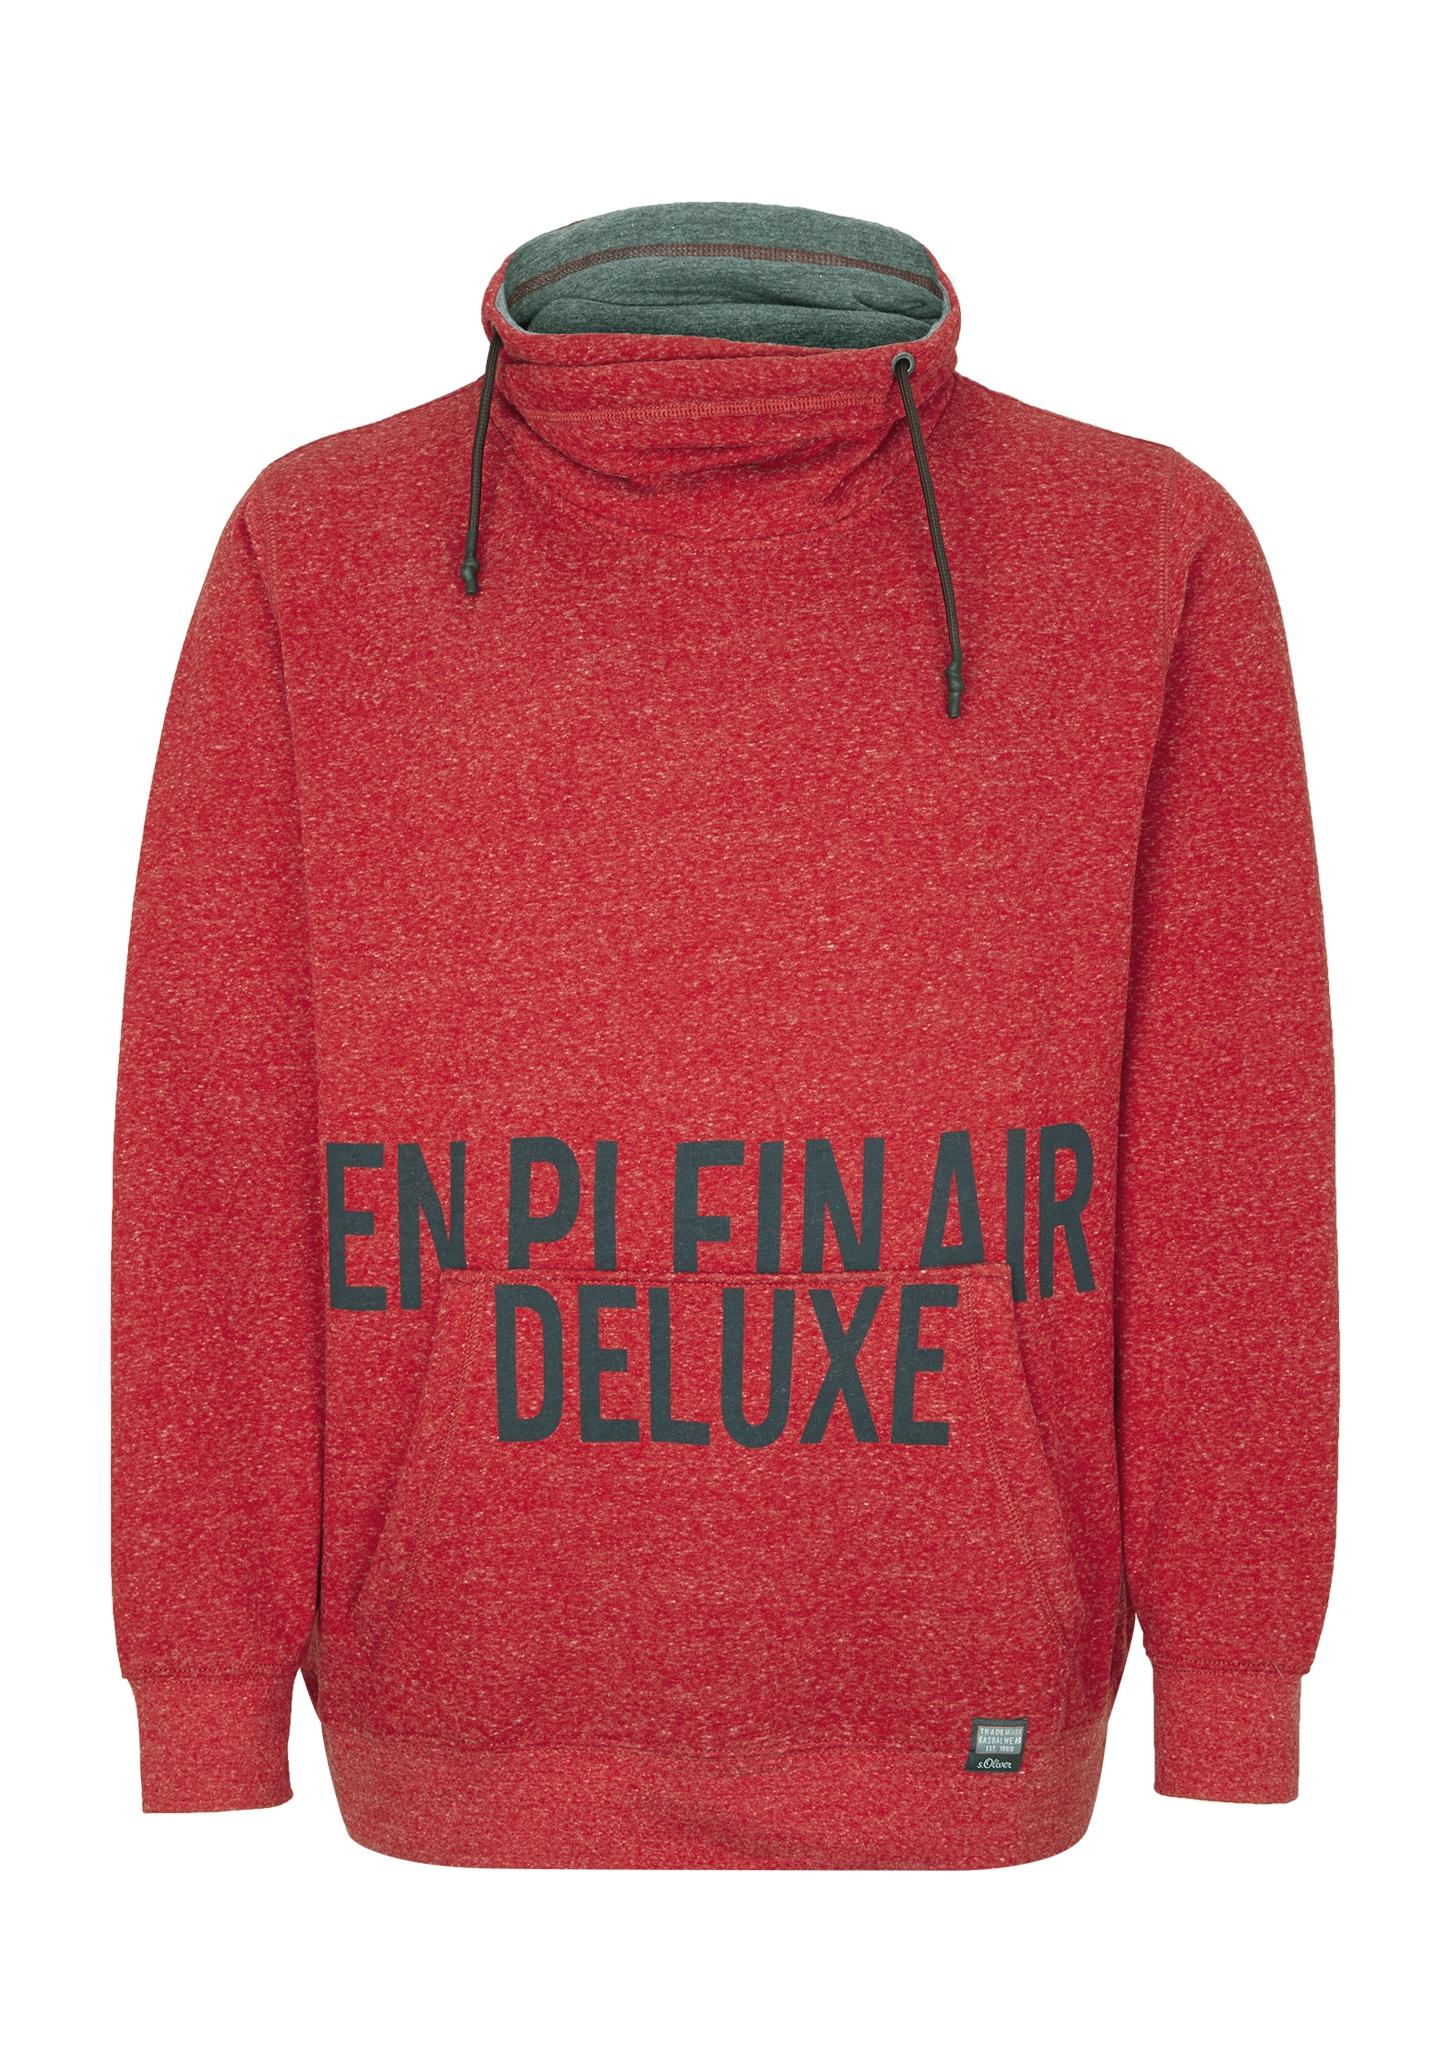 Sweatshirt | Bekleidung > Sweatshirts & -jacken > Sweatshirts | Rot | 50% baumwolle -  33% viskose -  17% polyester | s.Oliver Men Big Sizes